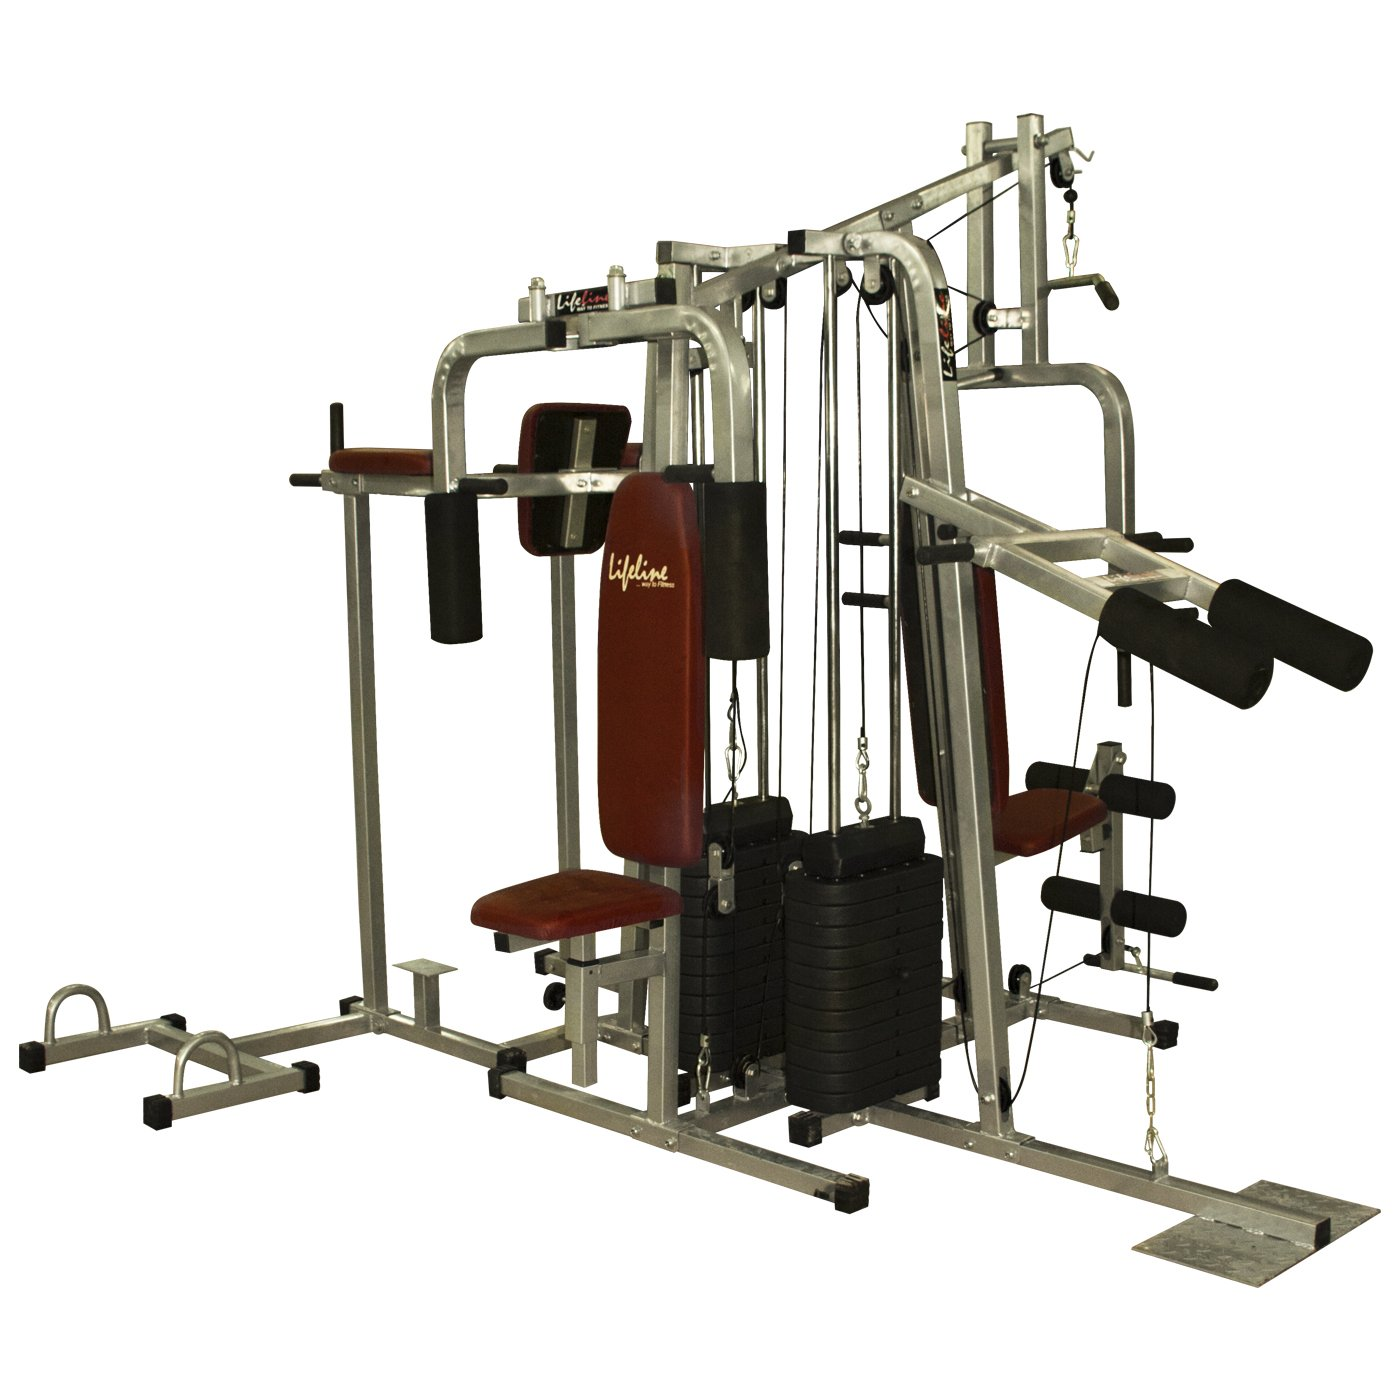 Lifeline workout equipment eoua